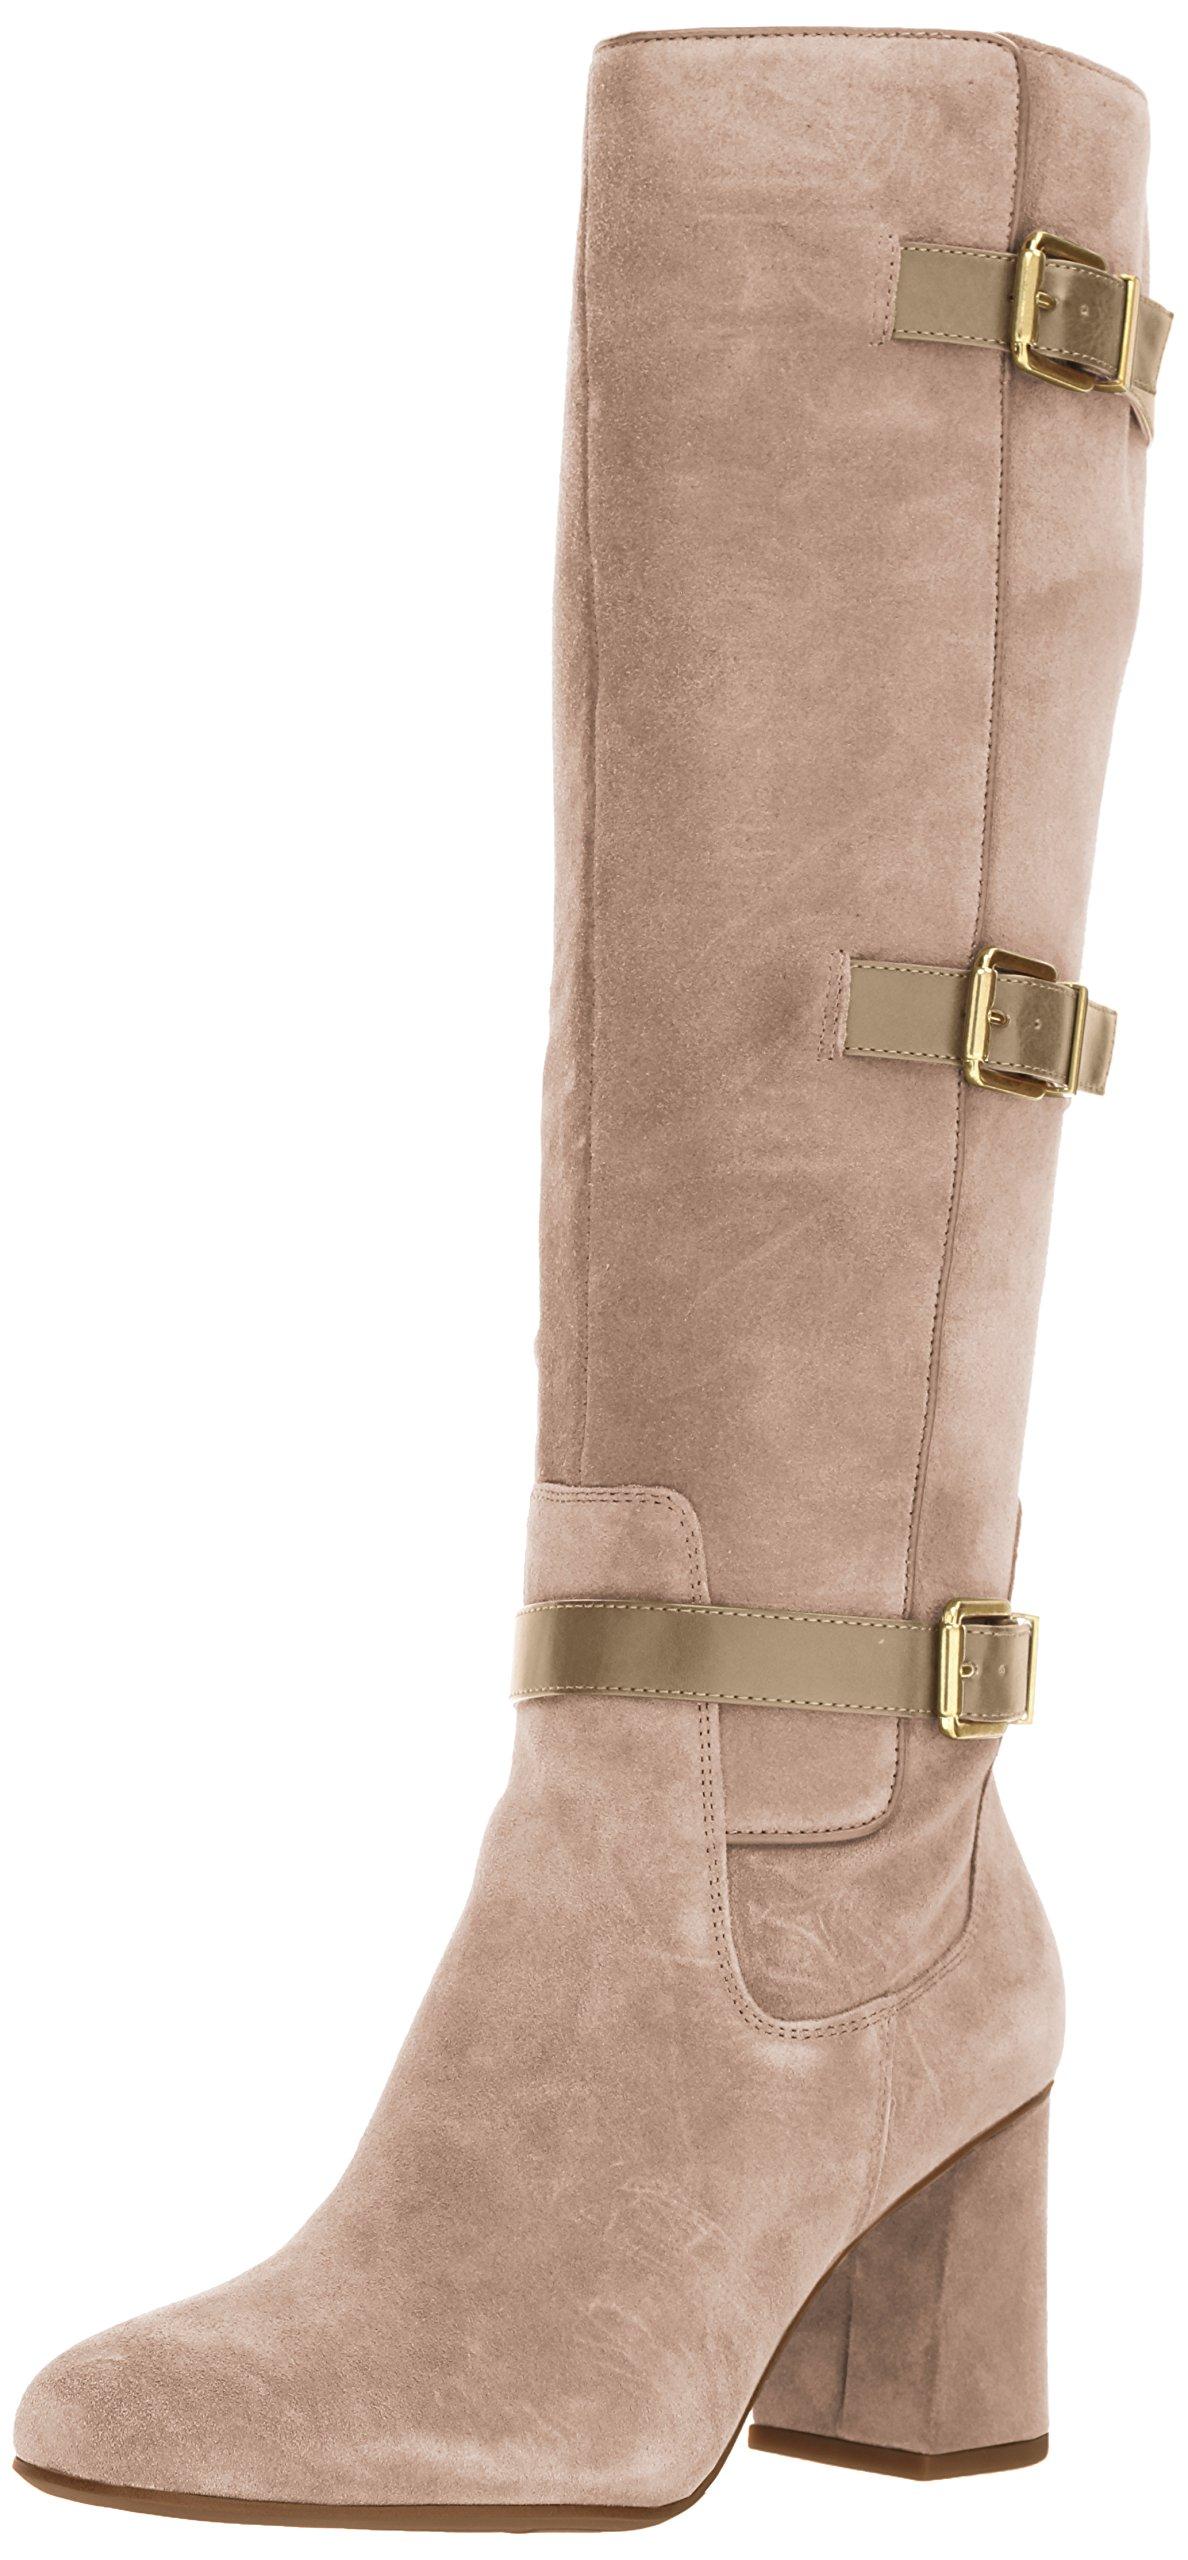 Franco Sarto Women's Knoll Knee High Boot, Cocco, 8.5 Medium US